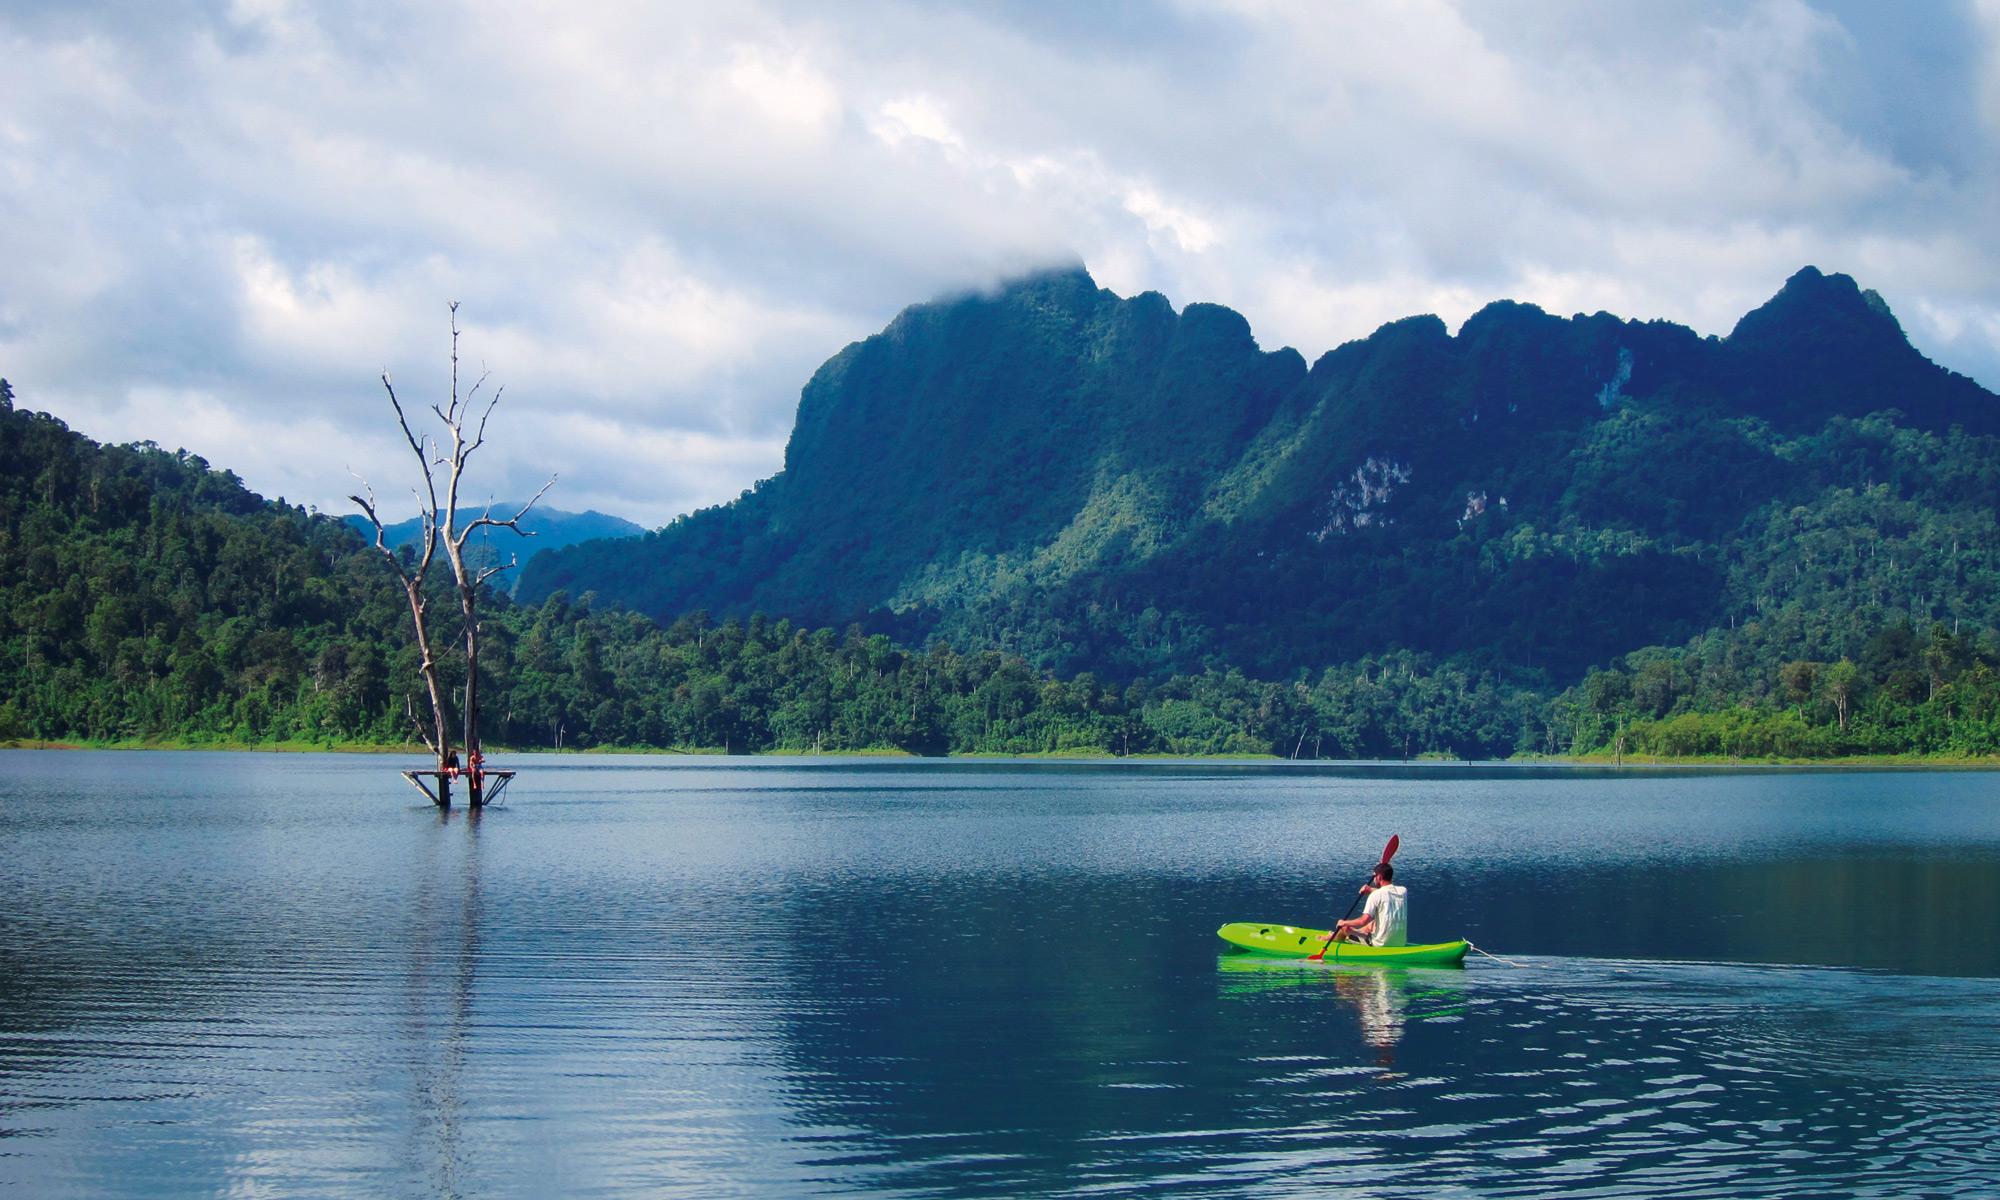 Khao Sok Lake Tour - Fantastische Natur